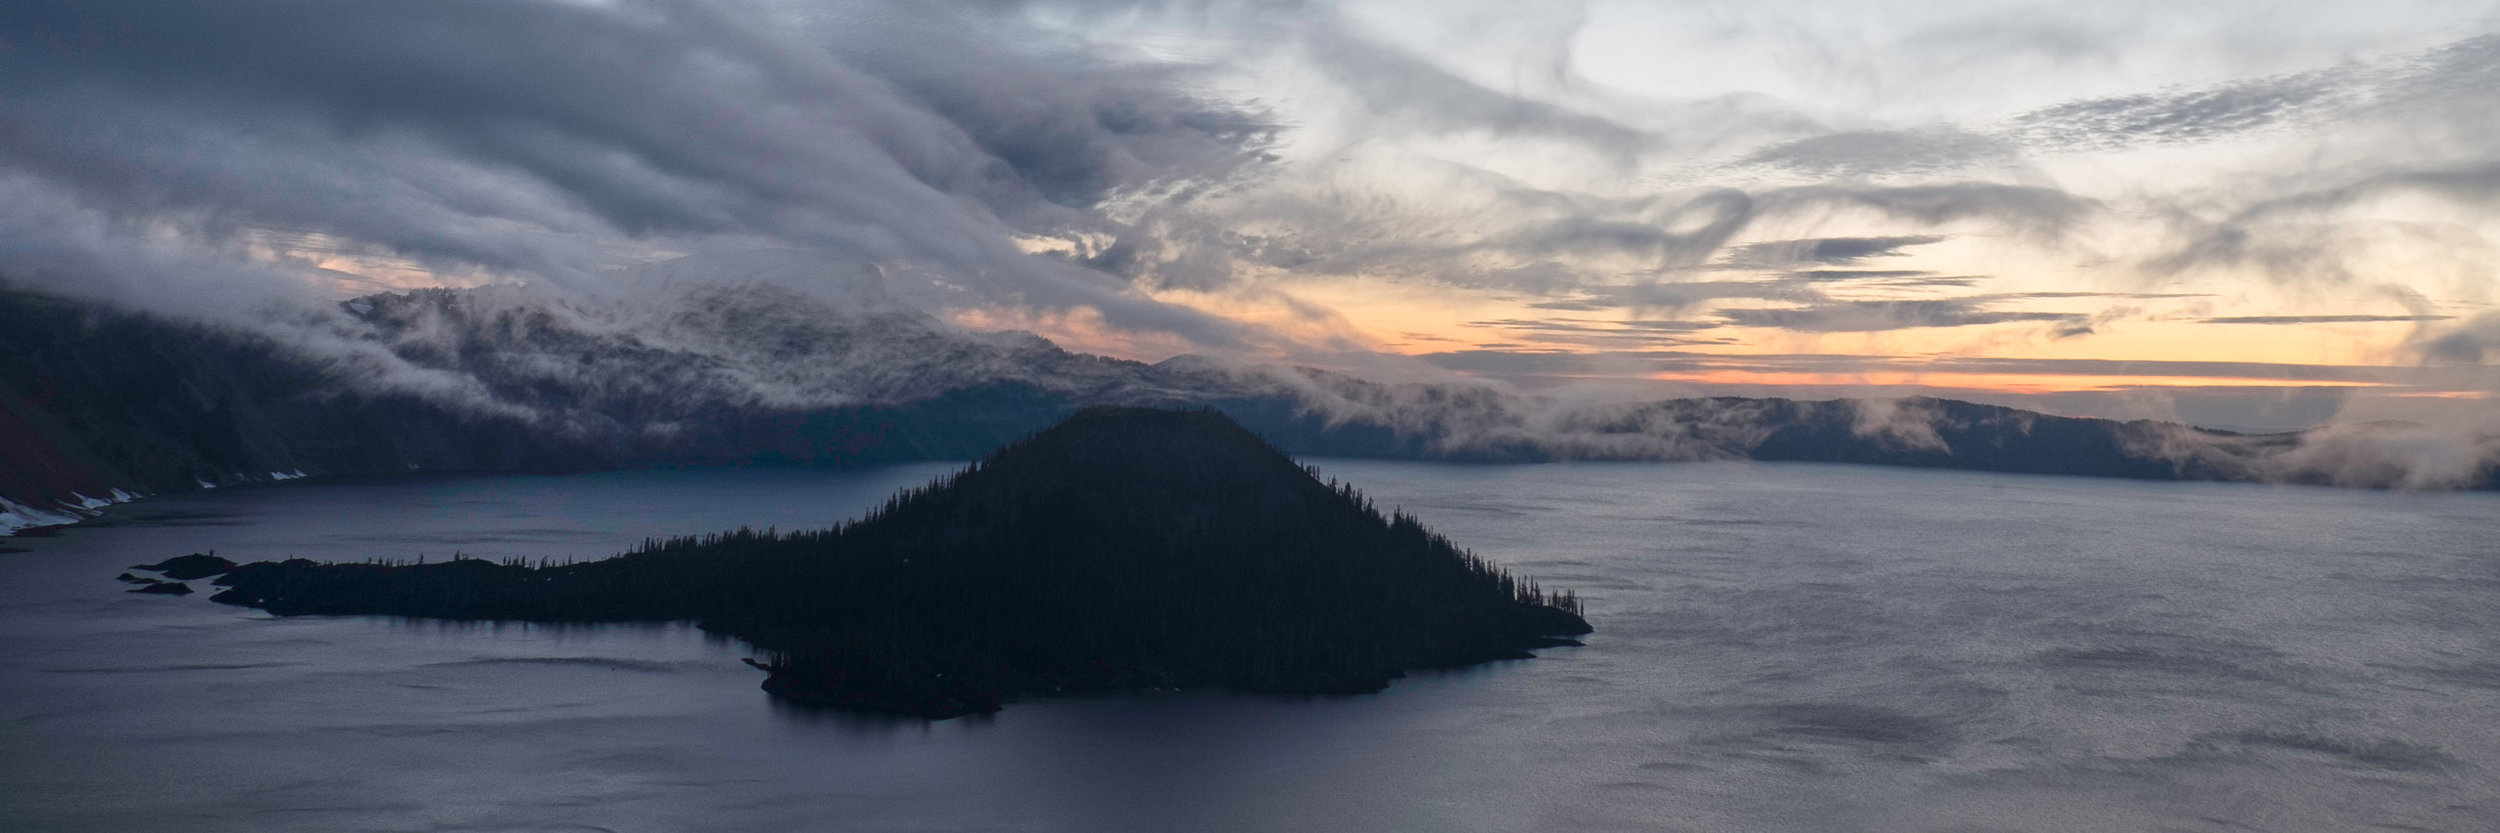 Crater Lake_2014 - -181-20140612_Crater_Lake_Rogue_River_Trip_0268.jpg